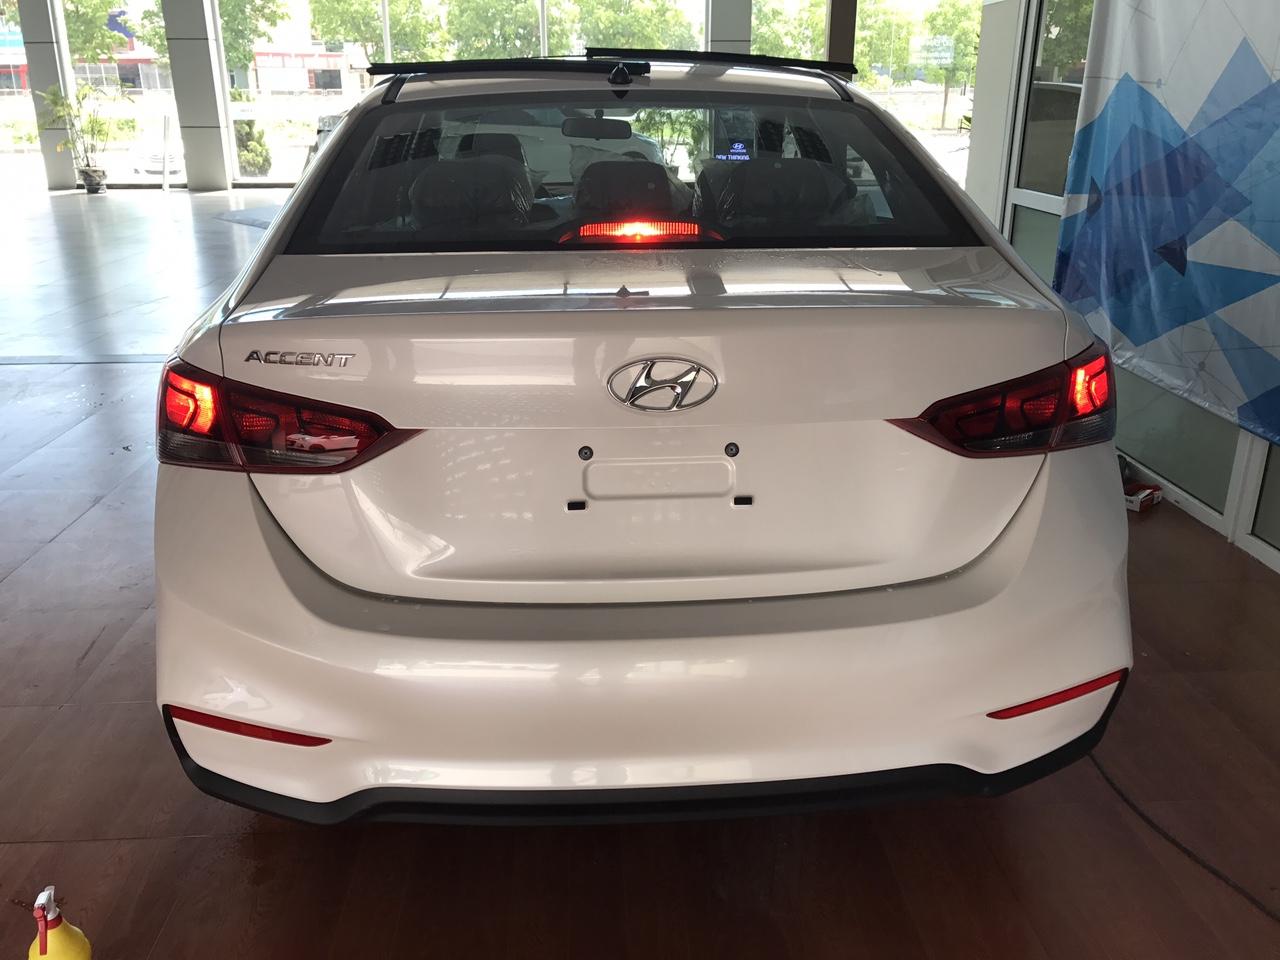 Hyundai Accent 2019 tiêu chuẩn giá tốt, Hyundai An Phú, Hyundai Accent, Xe Hyundai